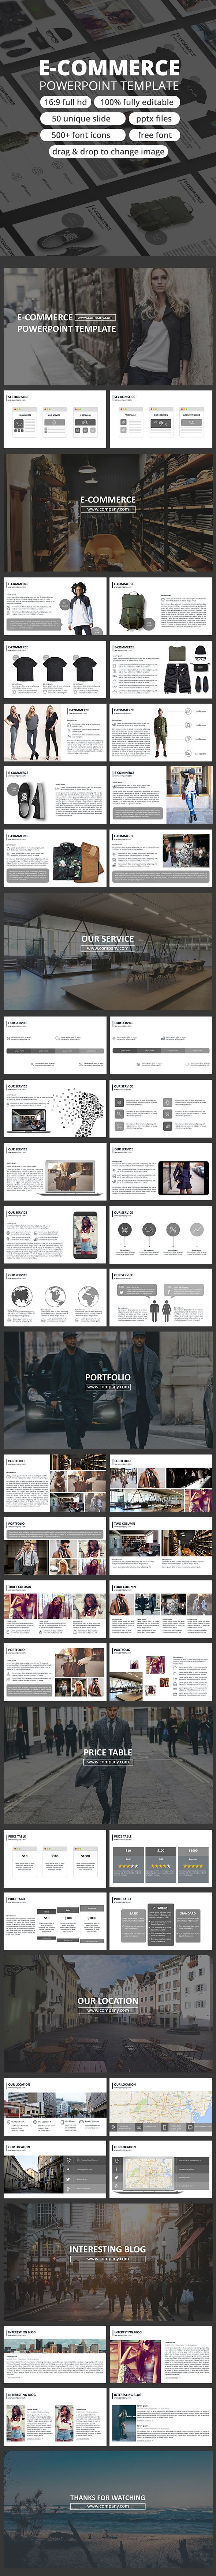 E-commerce -Powerpoint Presentation - Business PowerPoint Templates ...